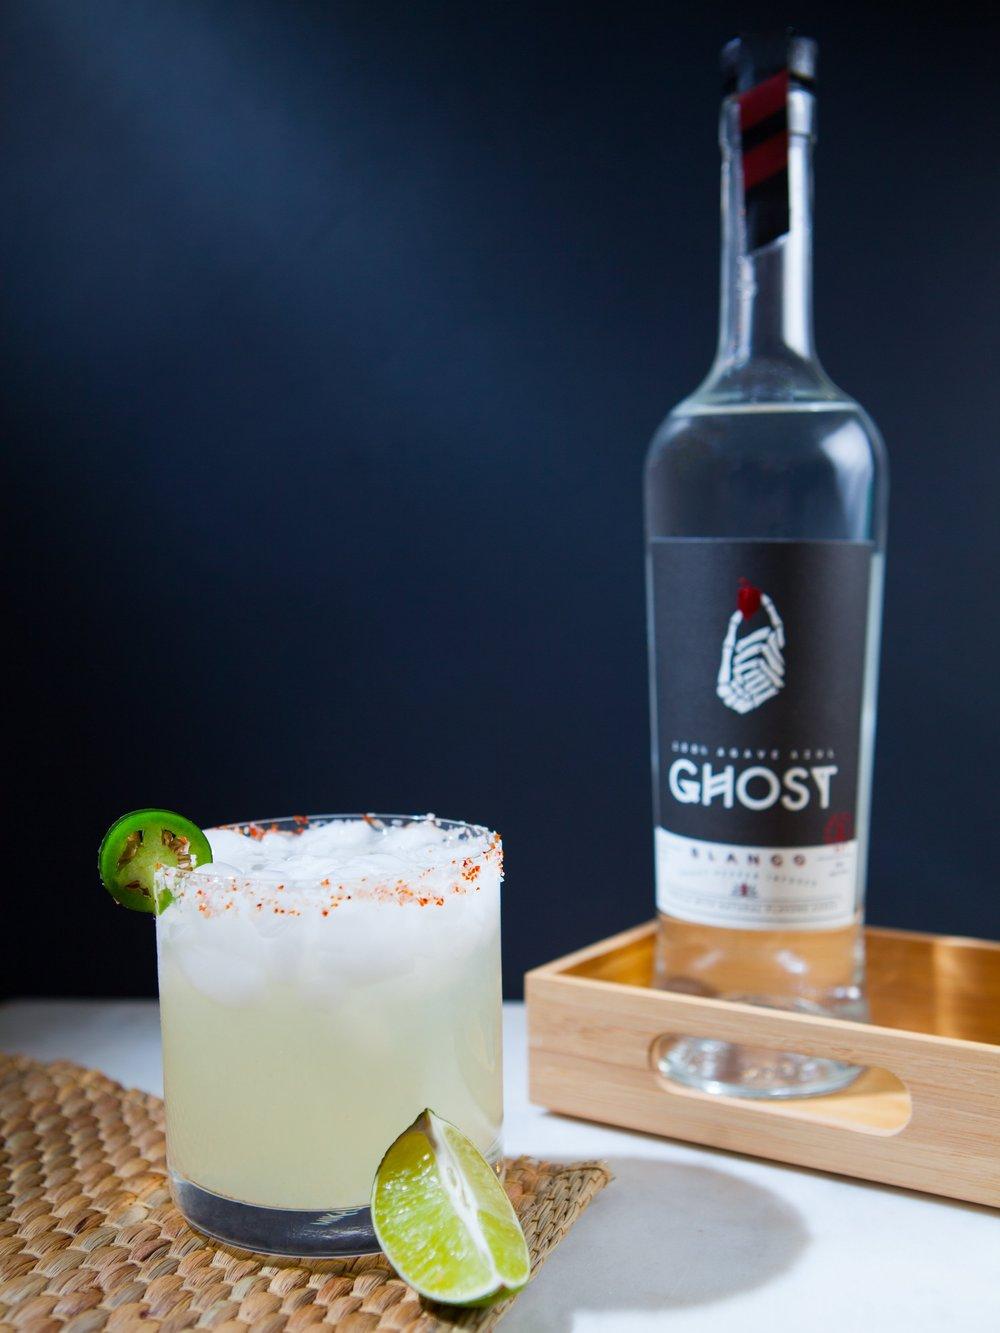 Anna+ghost+tequila-144-Edit.jpg